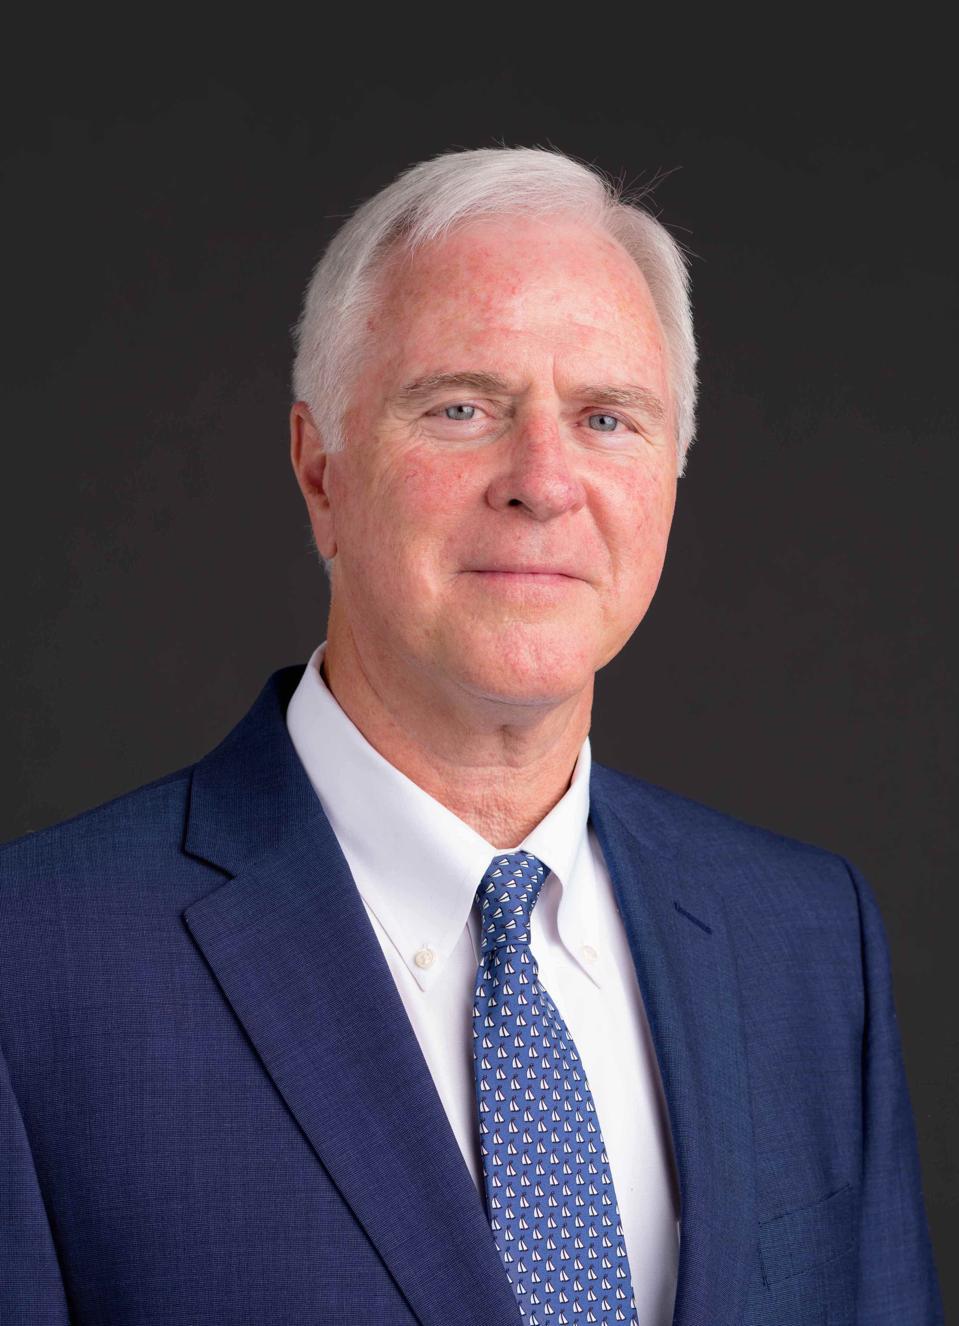 Bill Beaton, CEO of Cabot Creamery Co-operative